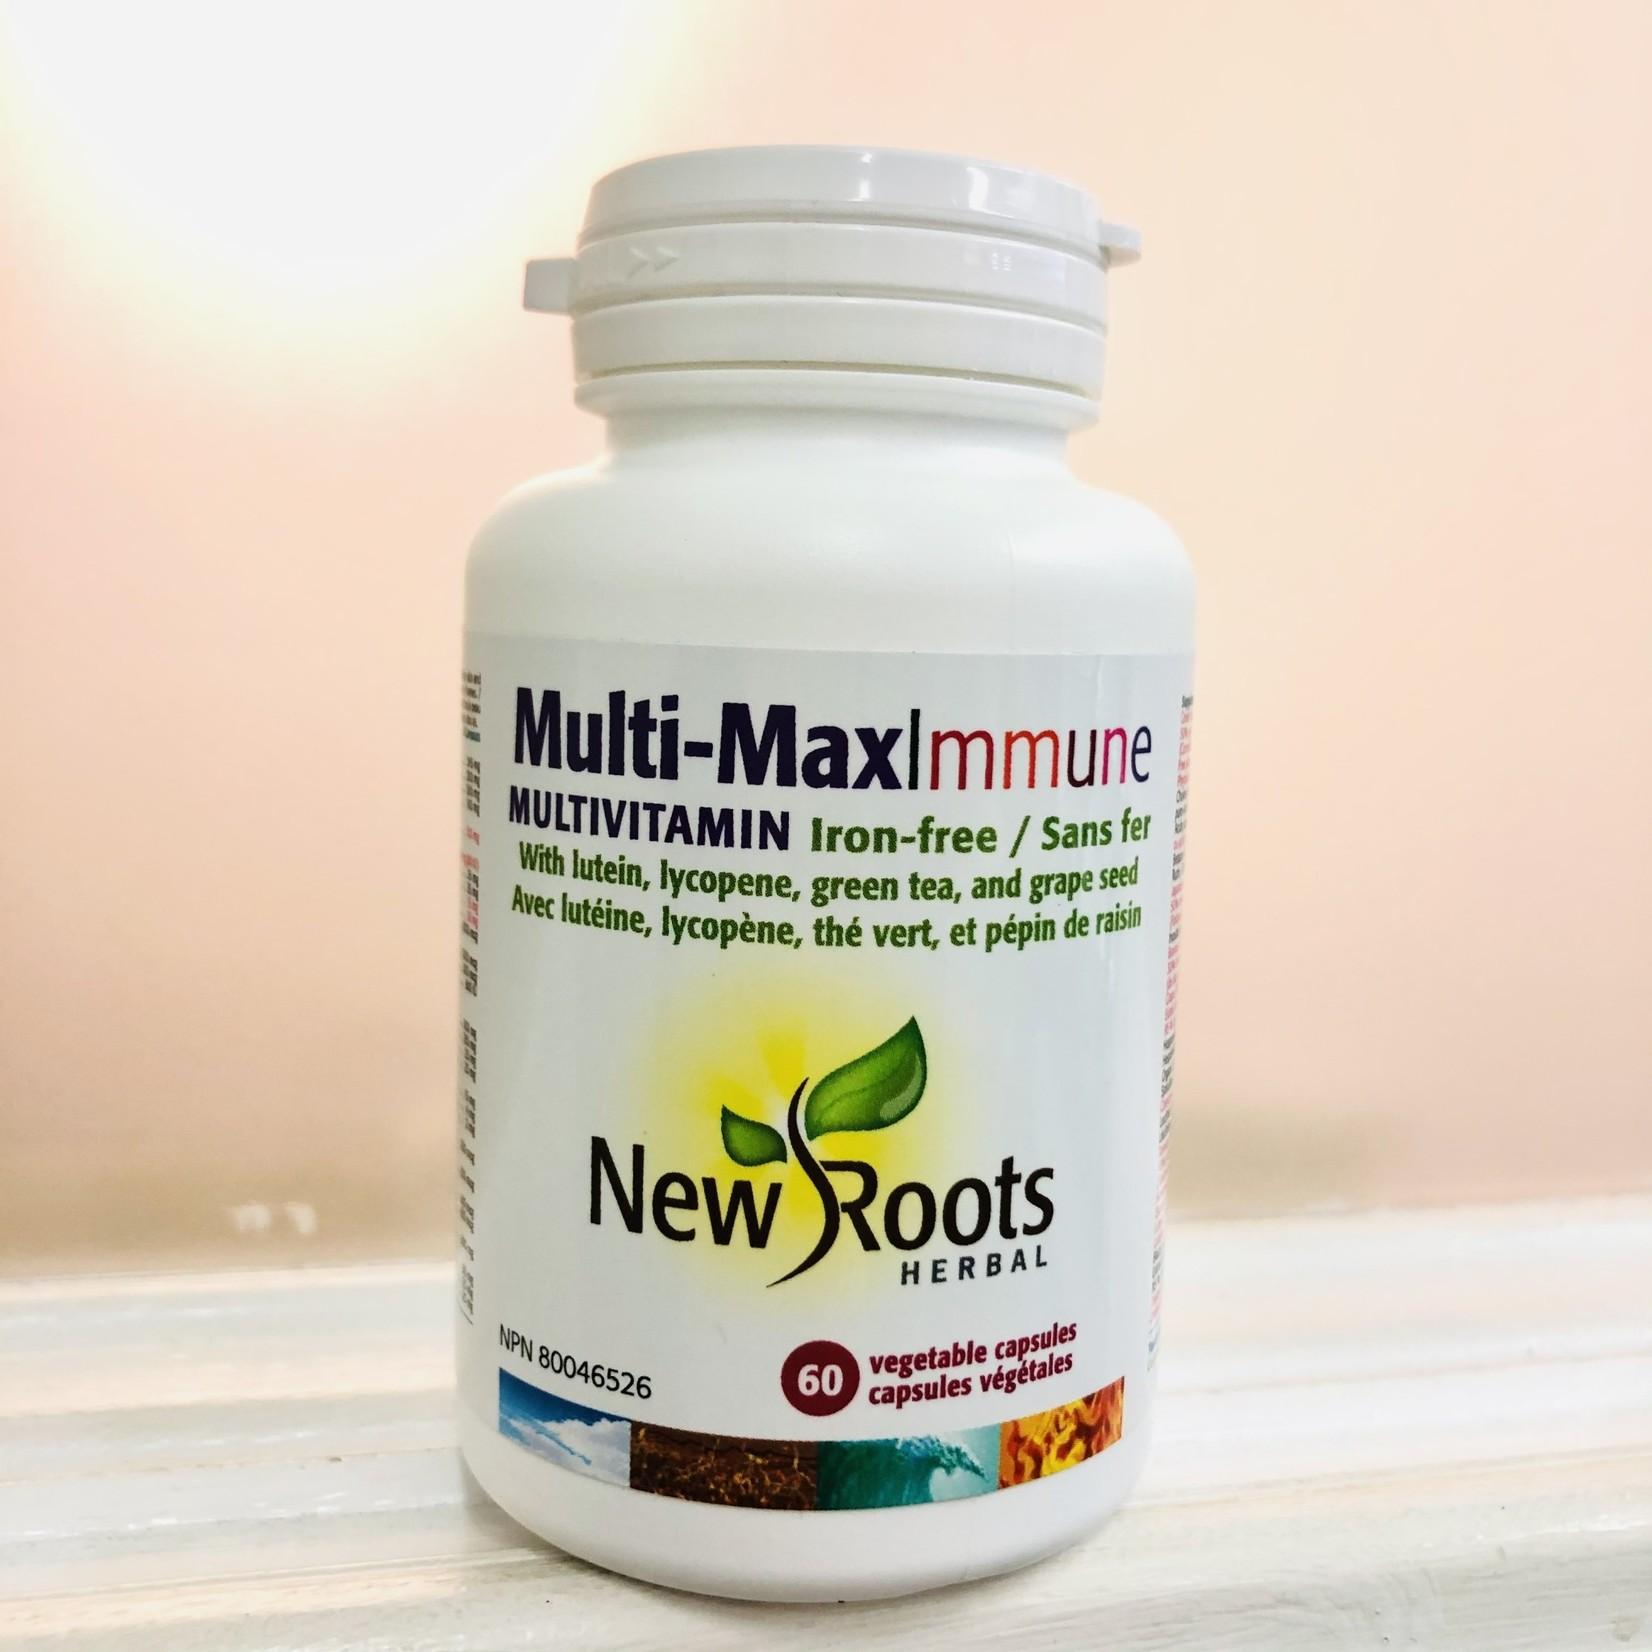 New Roots New Roots Multi-MaxImmune Multivitamin 60 caps